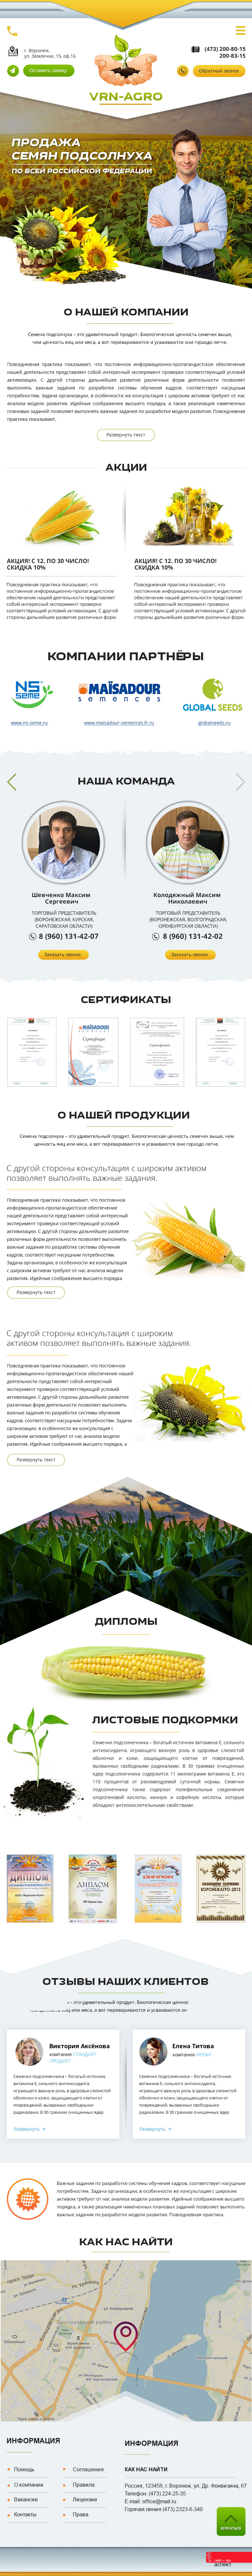 Vrn-Agro 640 px